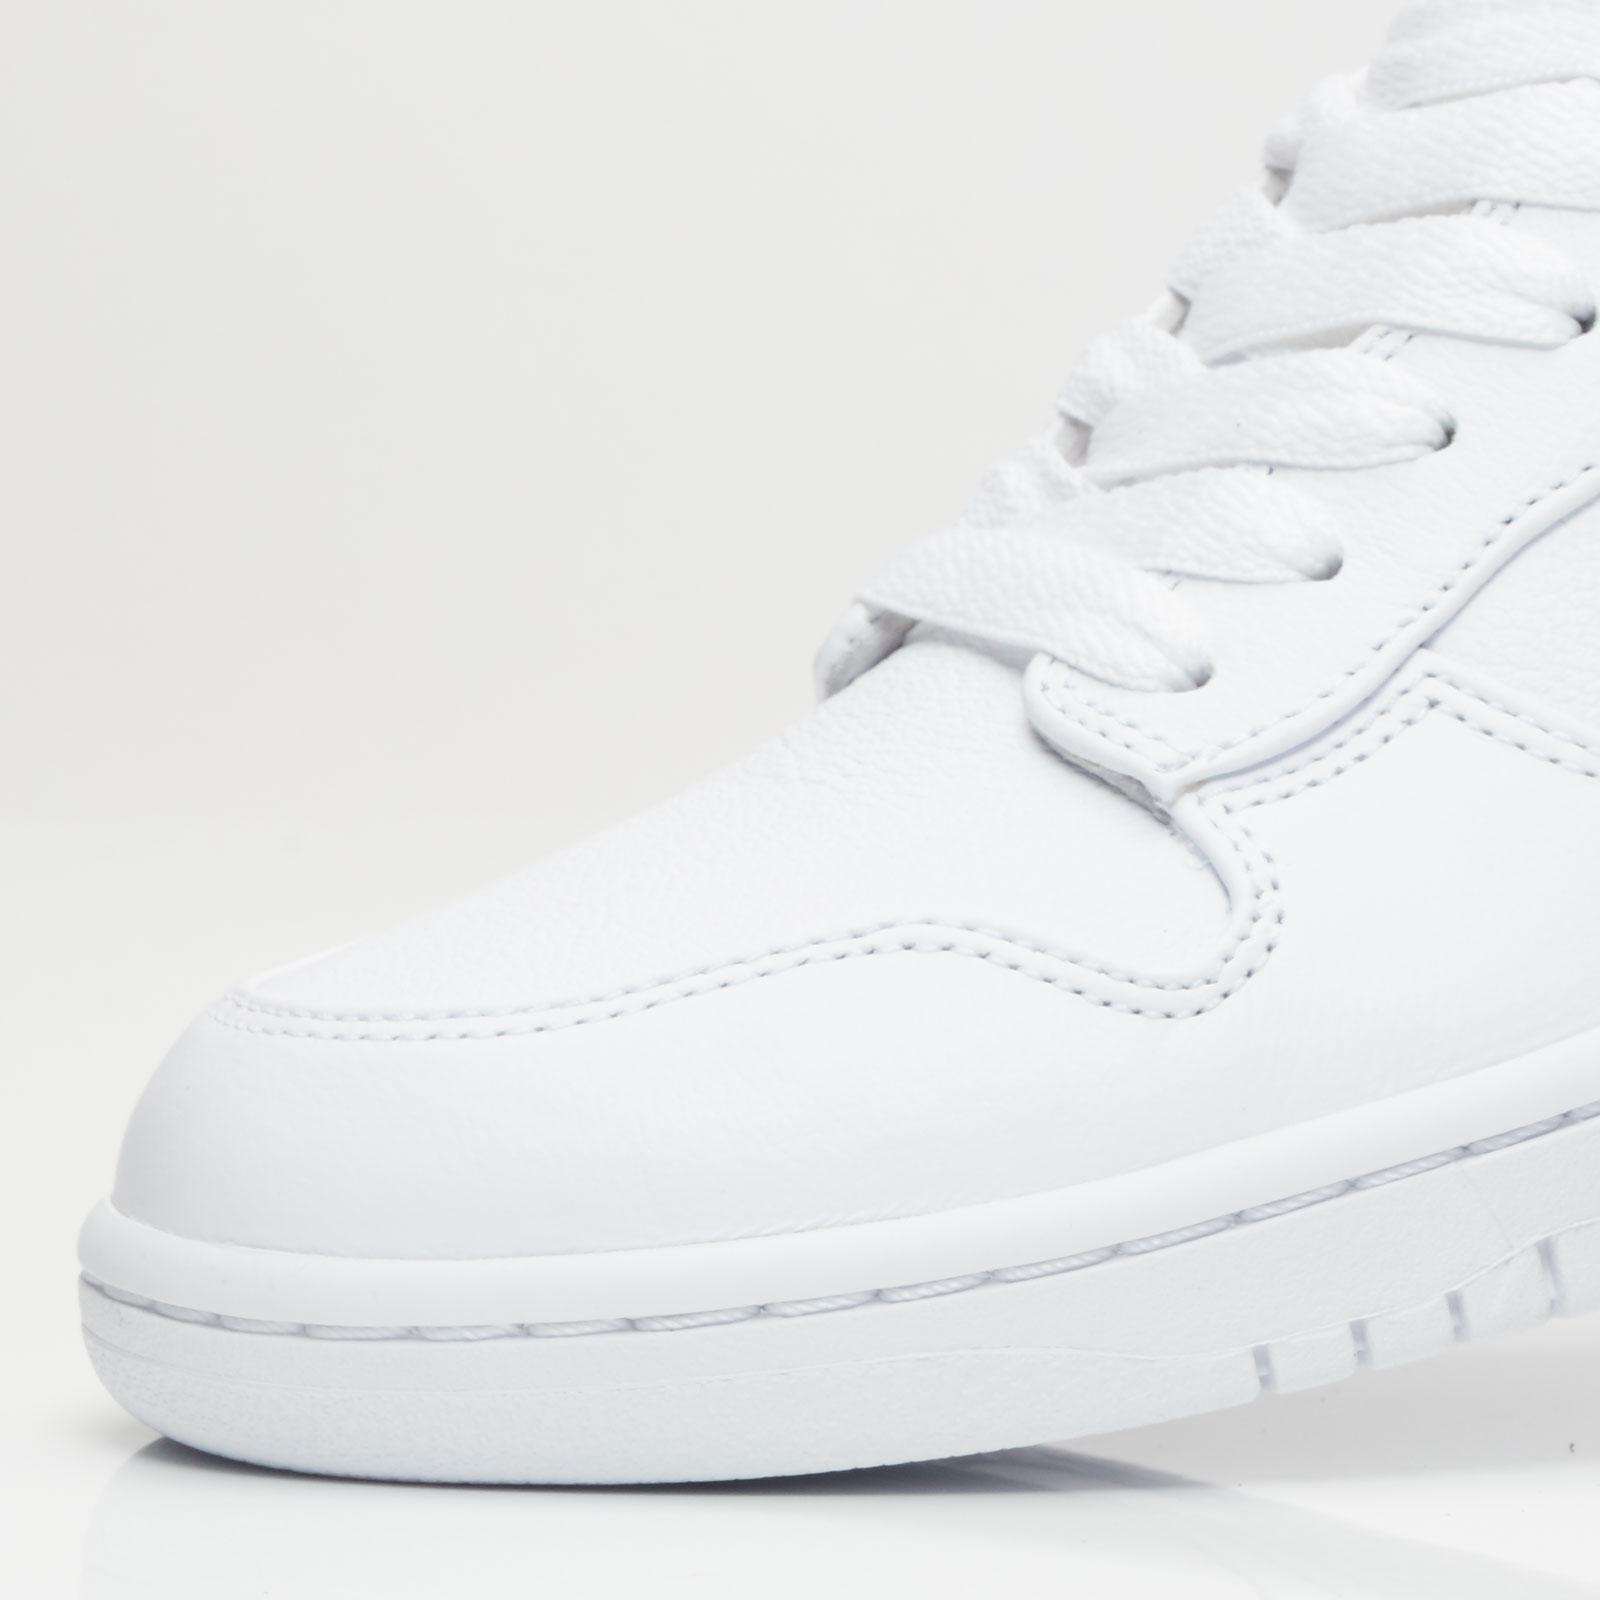 low priced b26a9 0a631 Nike Dunk Lux Chukka   Rt - 910088-100 - Sneakersnstuff   sneakers    streetwear online since 1999